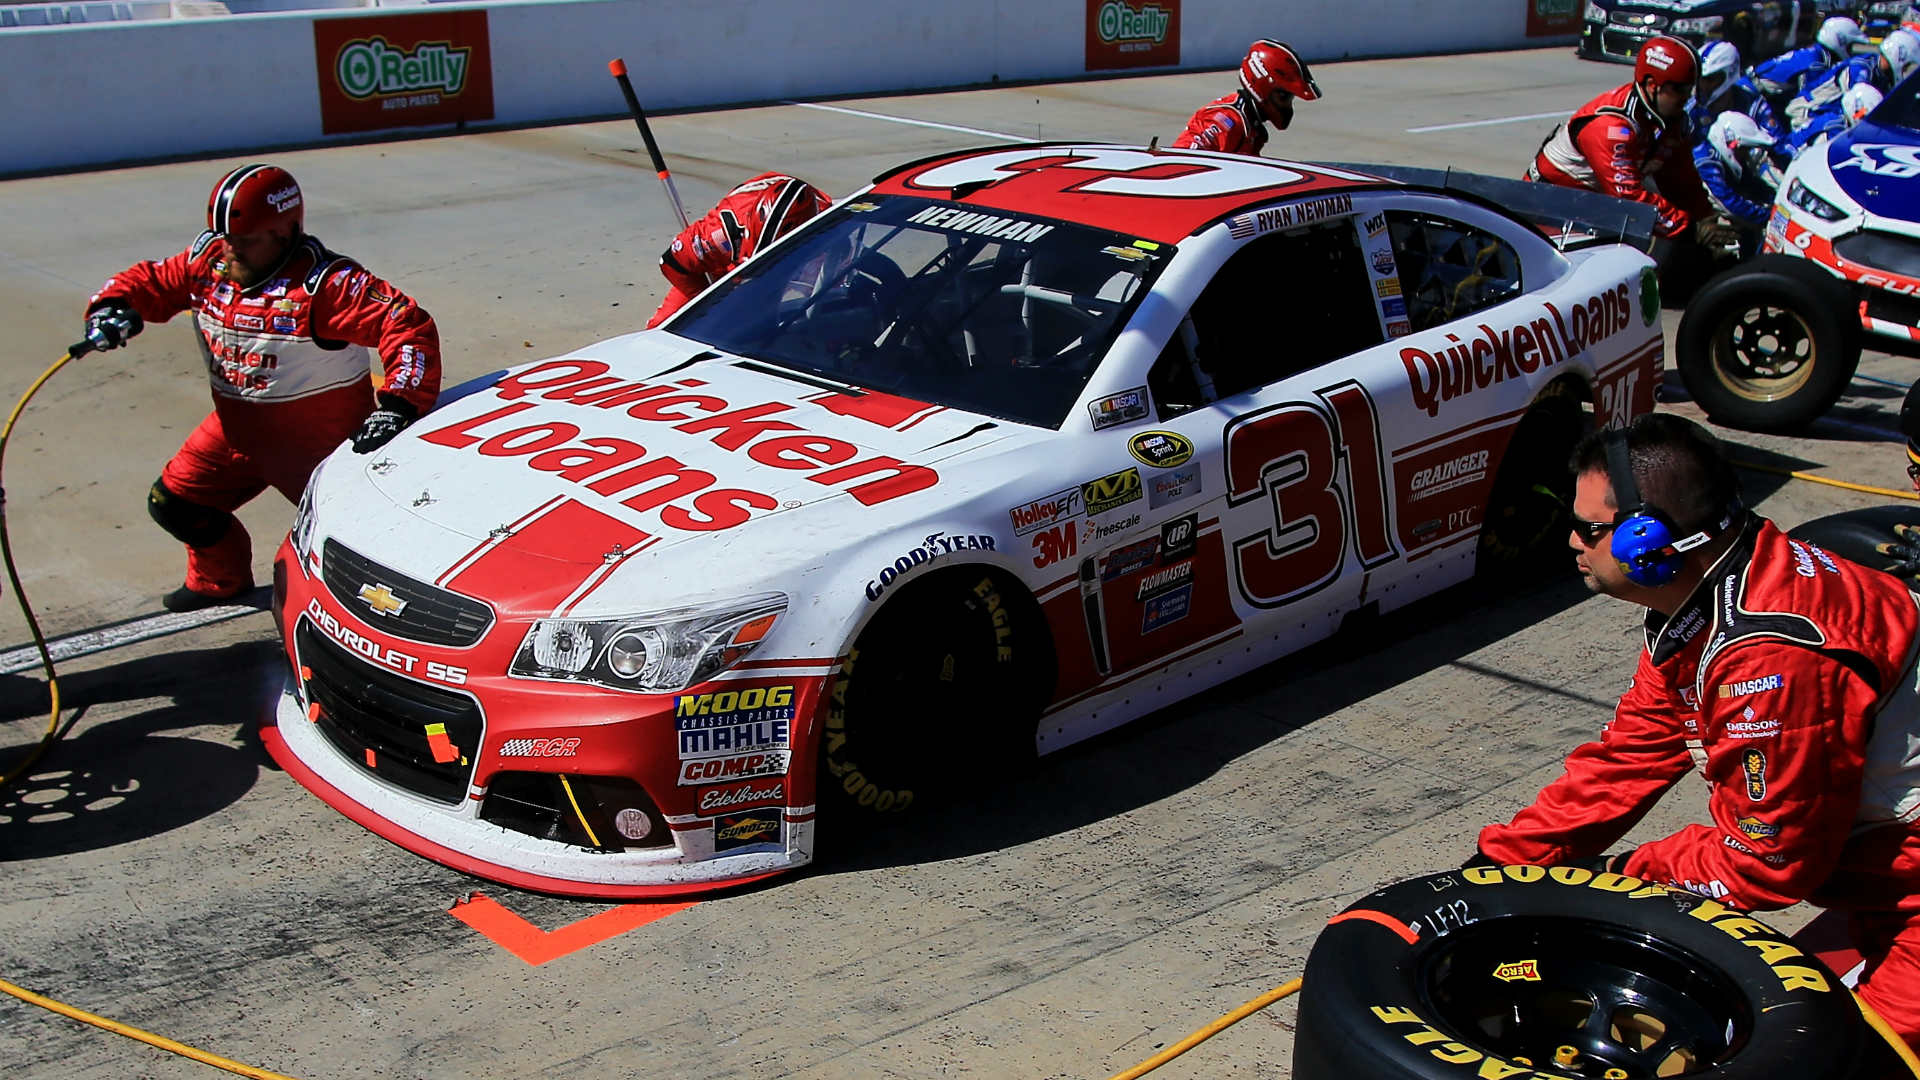 Ryan Newman's No. 31 Chevrolet